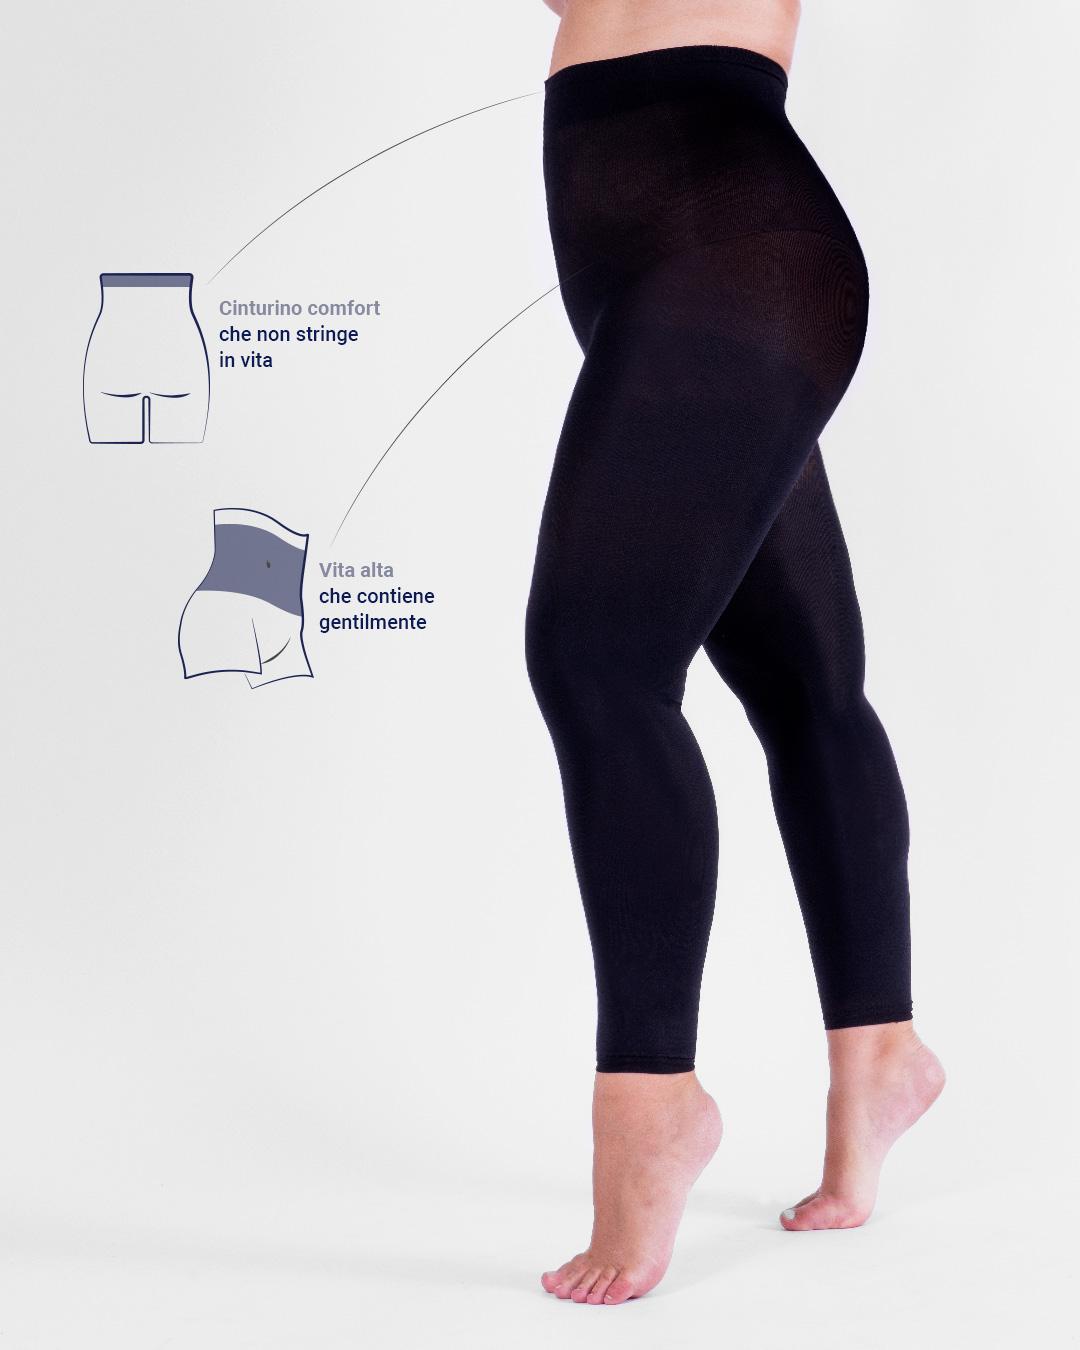 personalsize-exclusive-leggings-exclusive-prd_icon_006.jpg